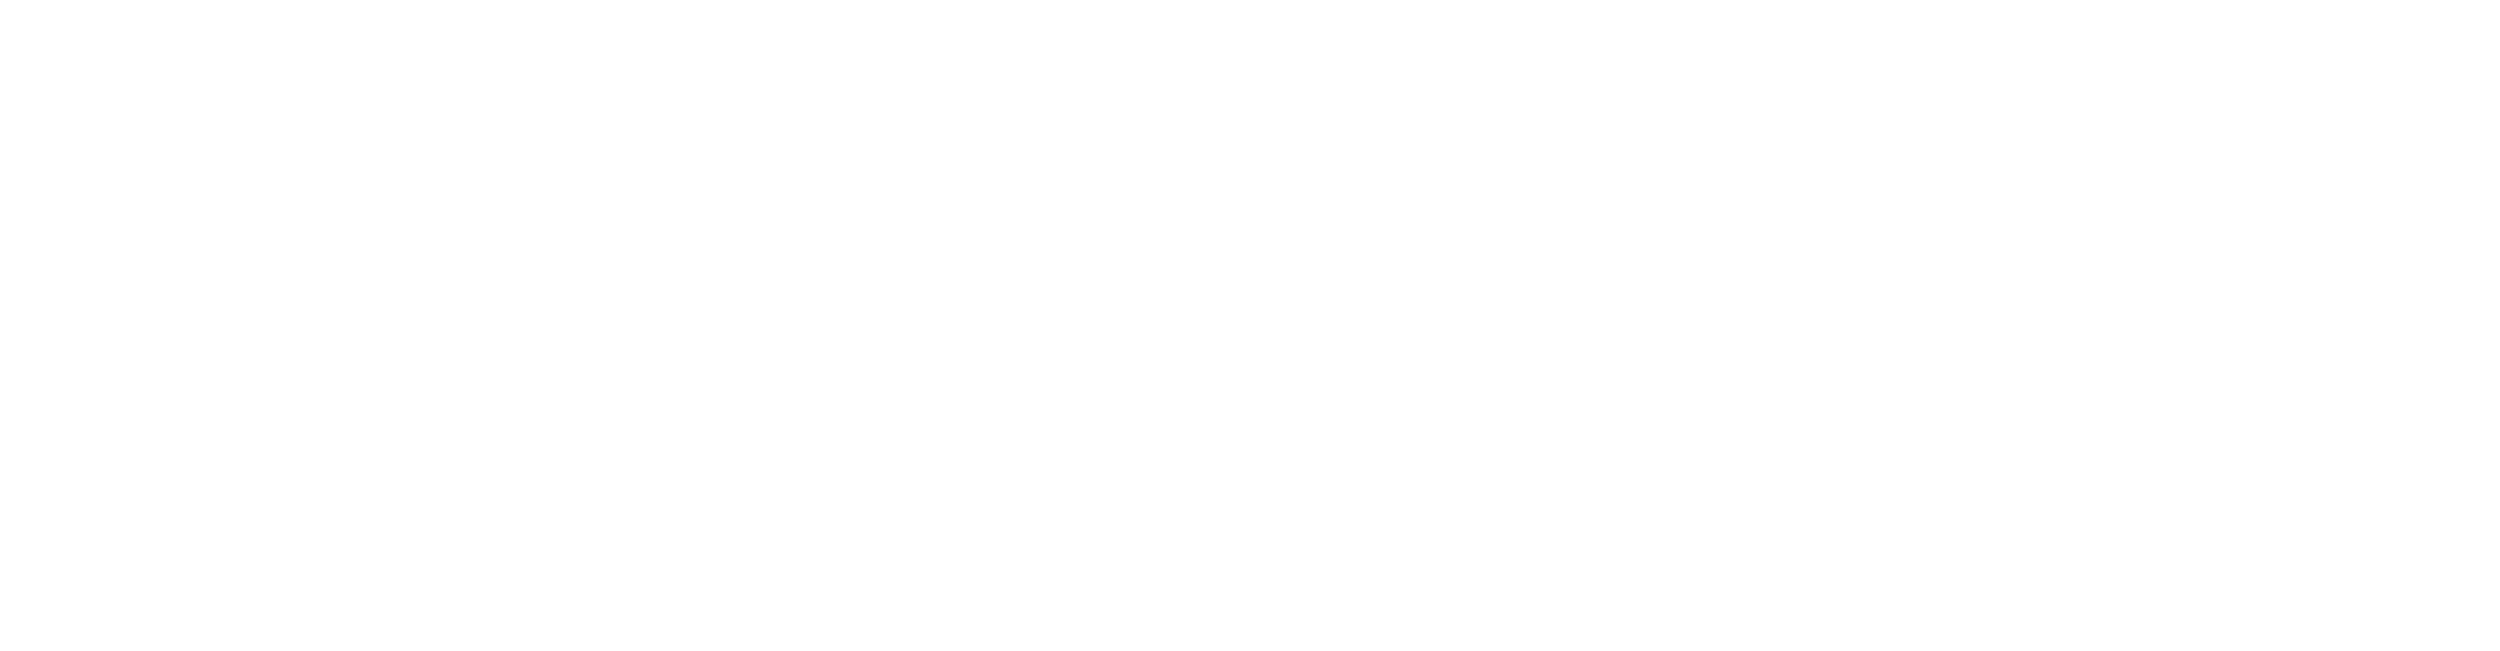 polymeris manutech usd laser femtoseconde